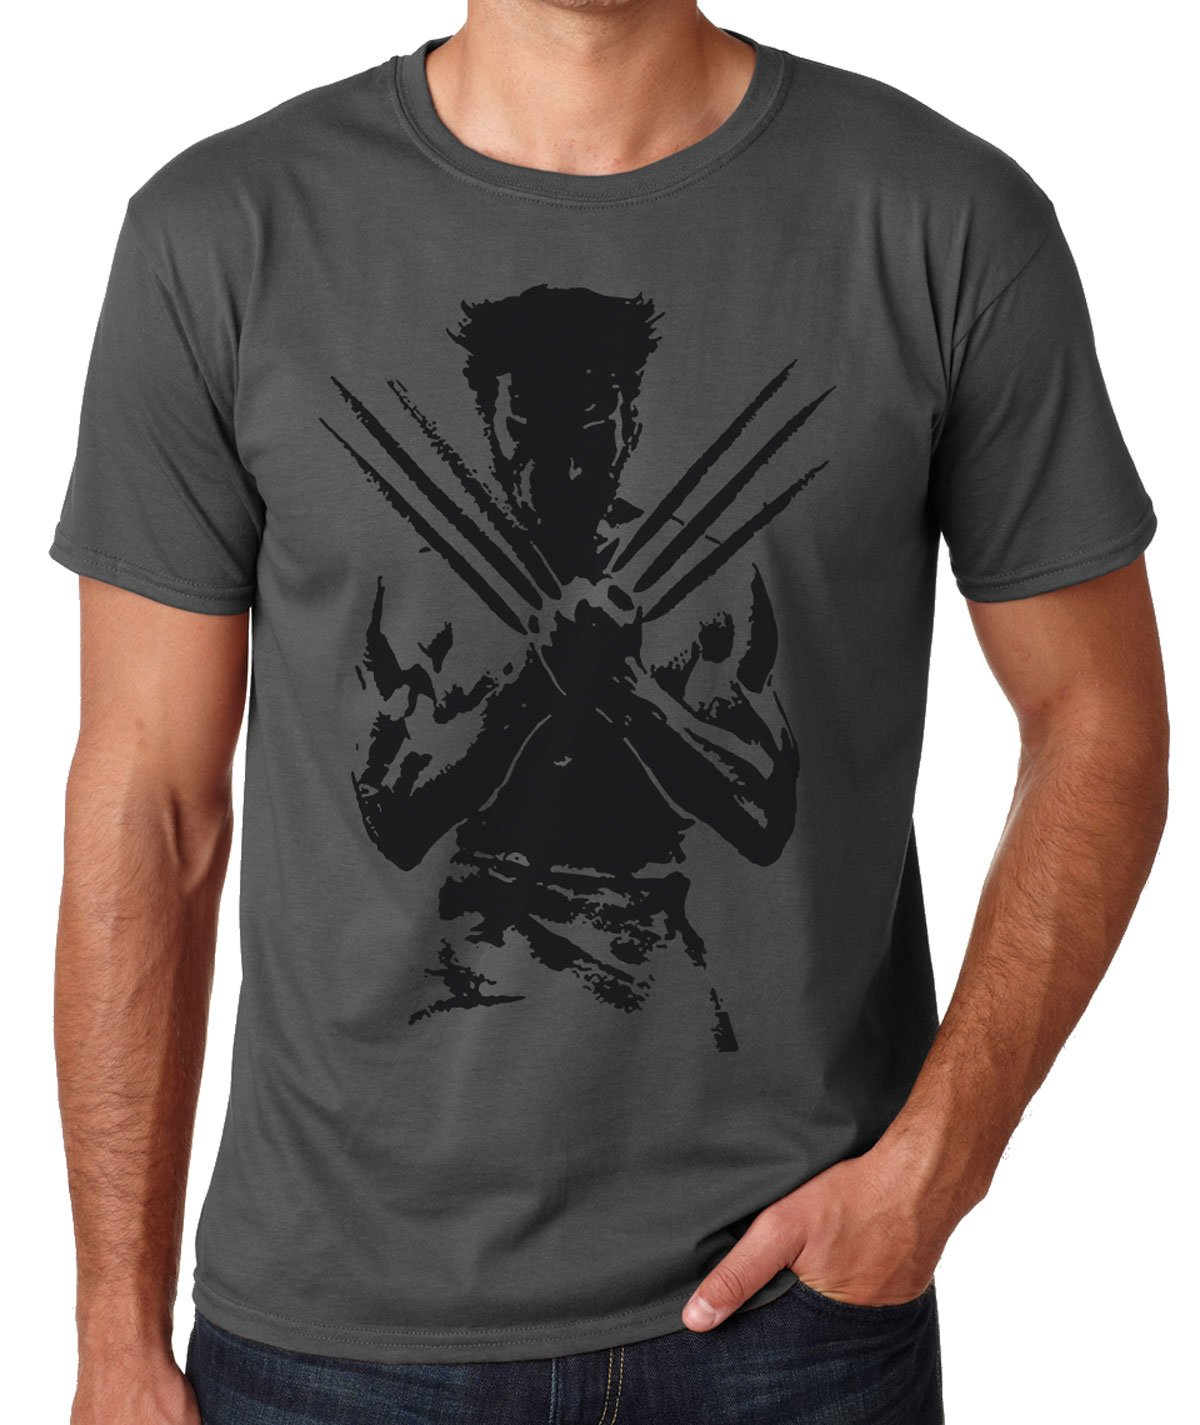 Bedford Screen Wolverine Logan T-Shirt Distressed Effect Men's Grey T-Shirt (M)